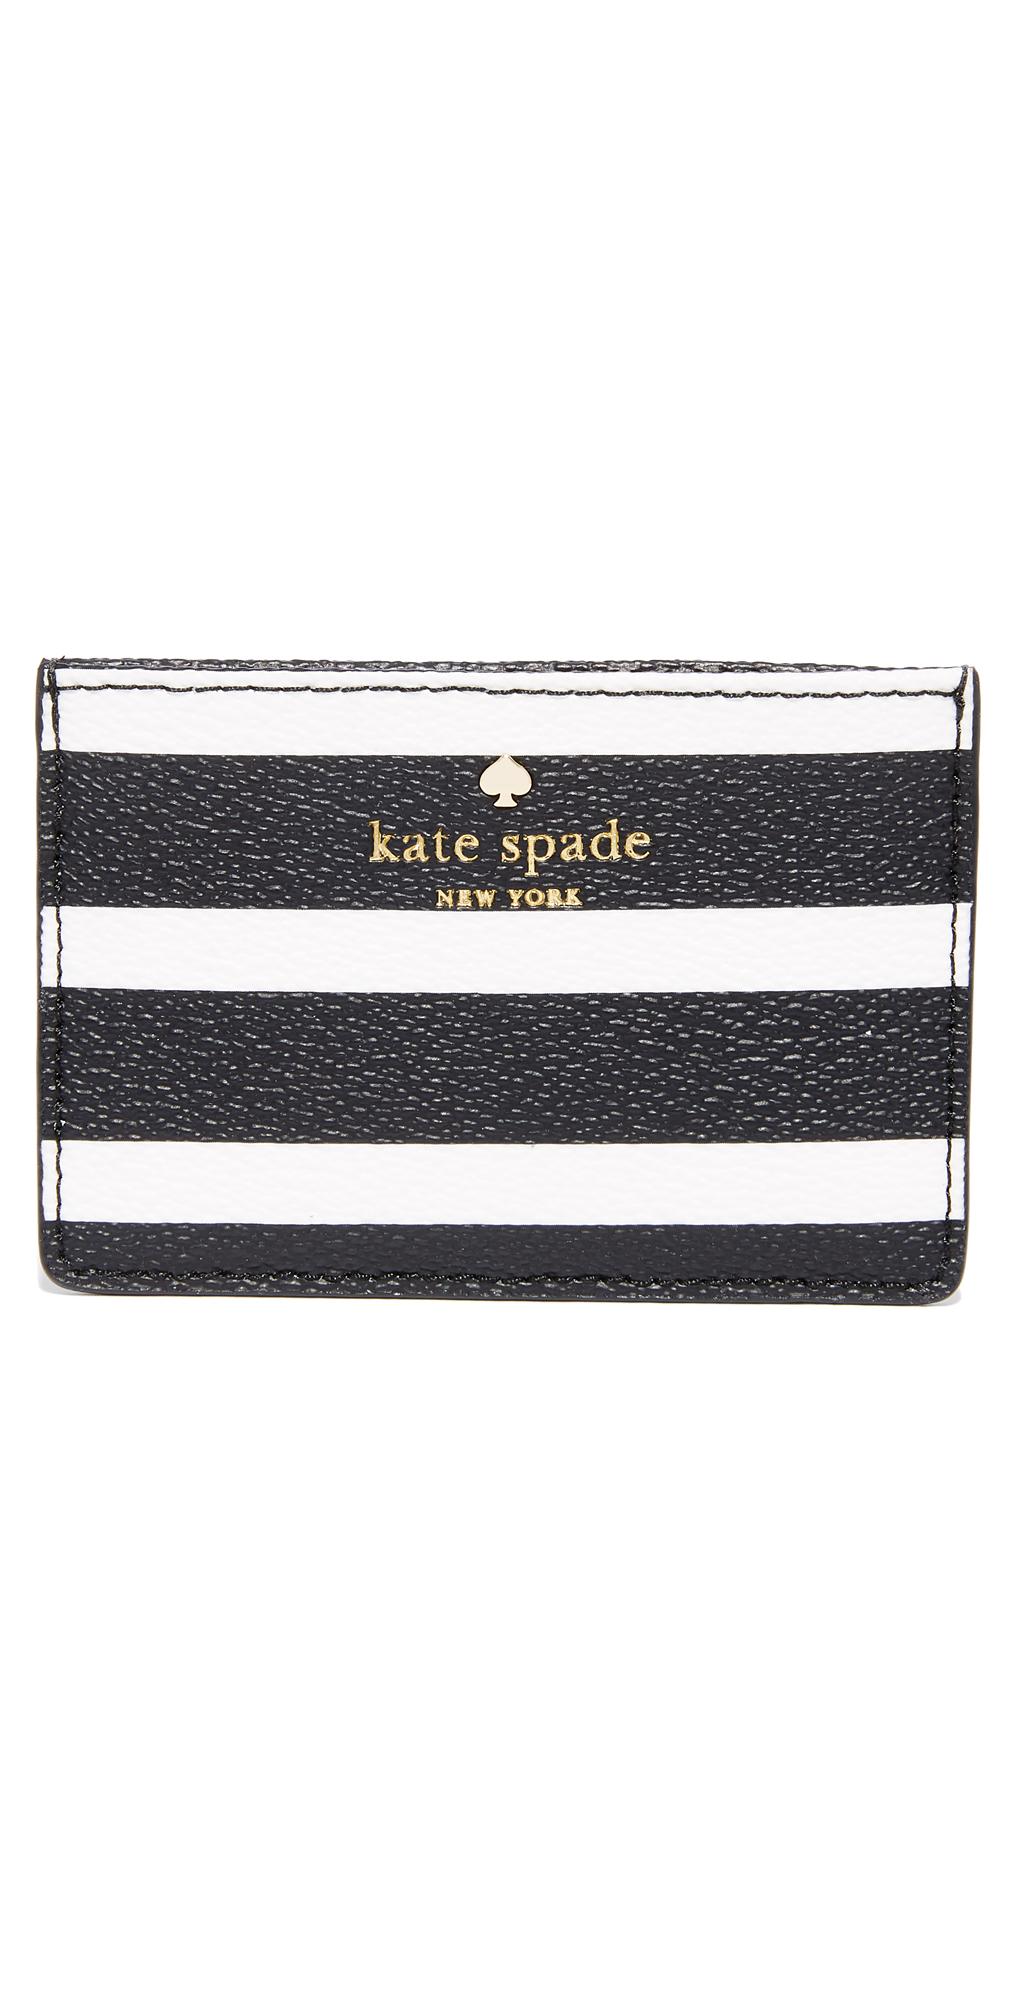 Card Holder Kate Spade New York